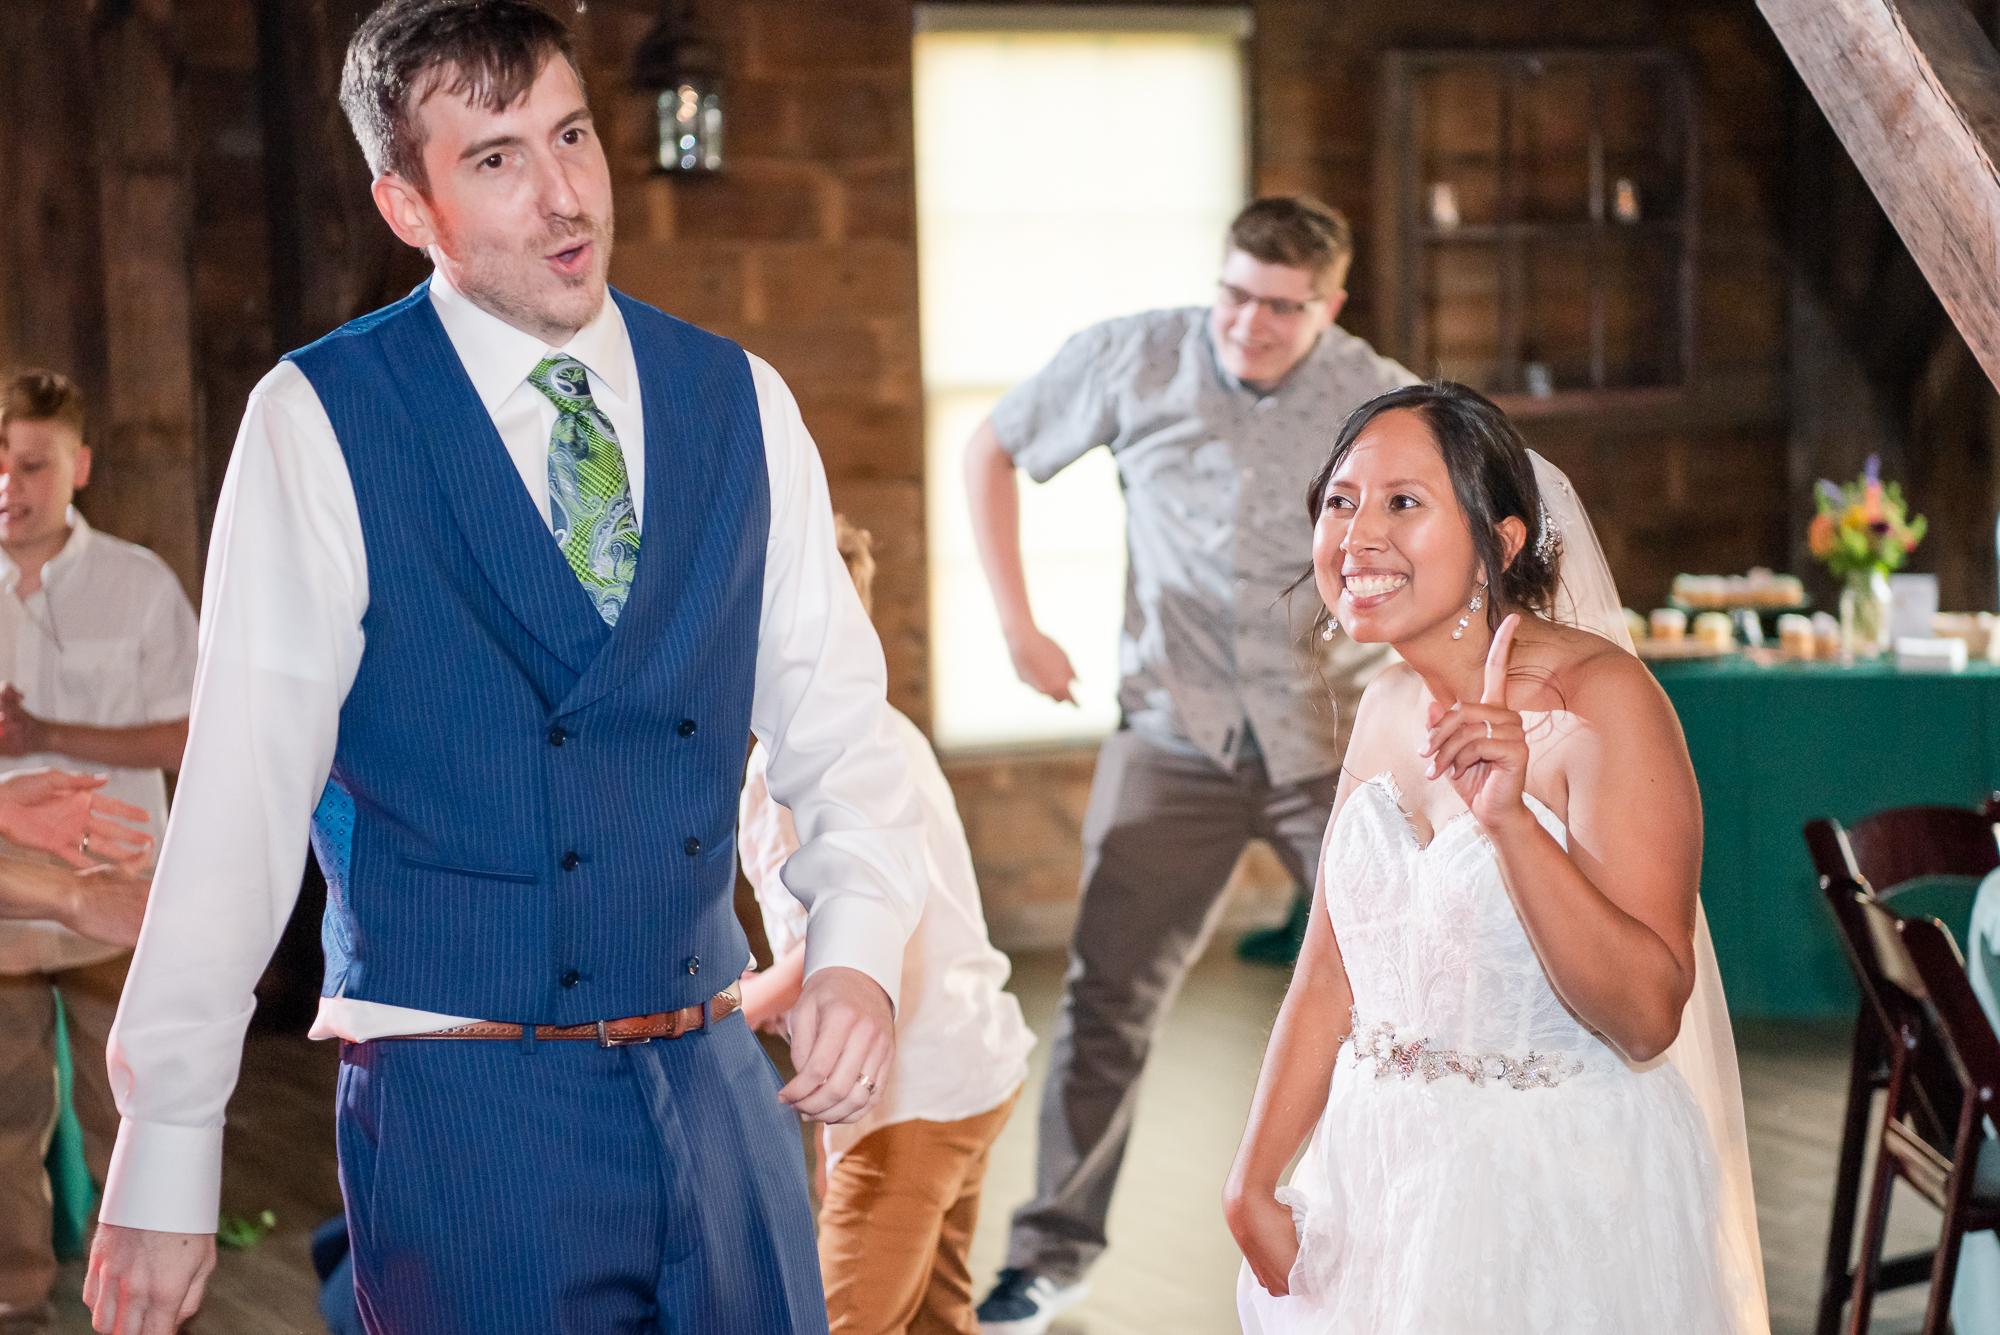 Maria+Adam_Summer Barn Wedding_The Barn at The North Star Preserve_Oberlin_Ohio-209.jpg